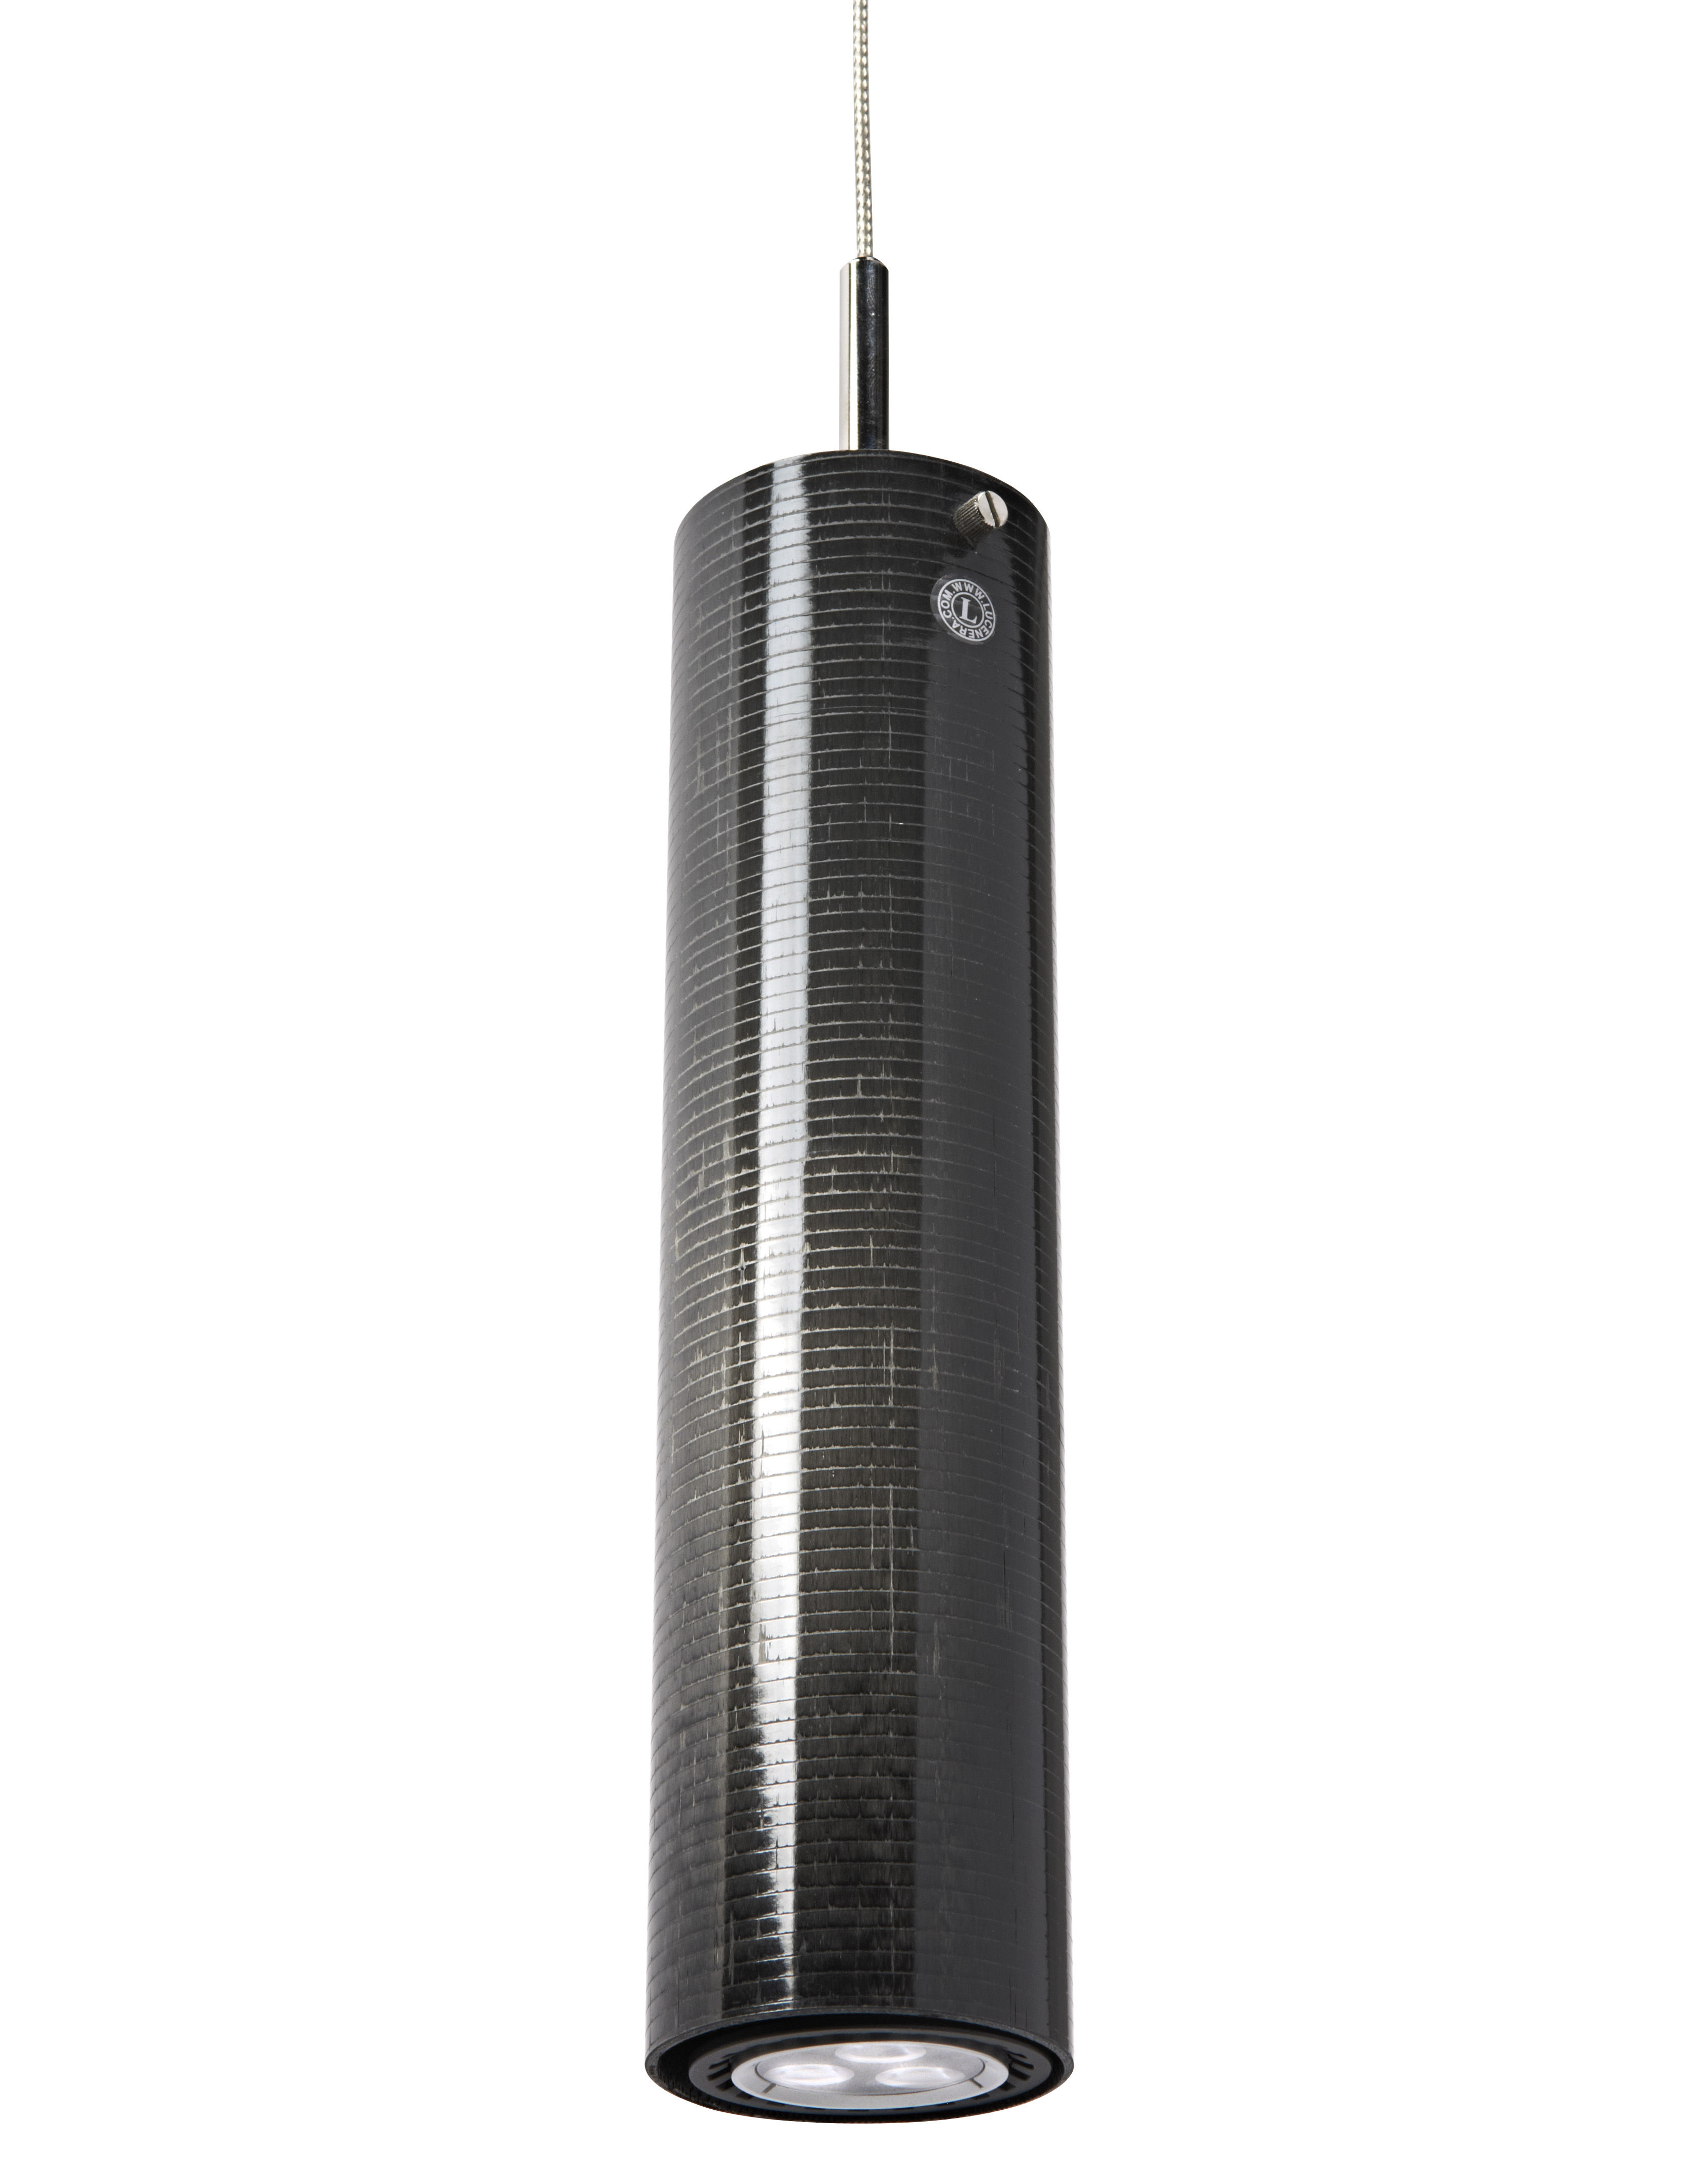 Leuchten - Pendelleuchten - Lucenera 504i Pendelleuchte LED - Catellani & Smith - Schwarz - Karbonfaser